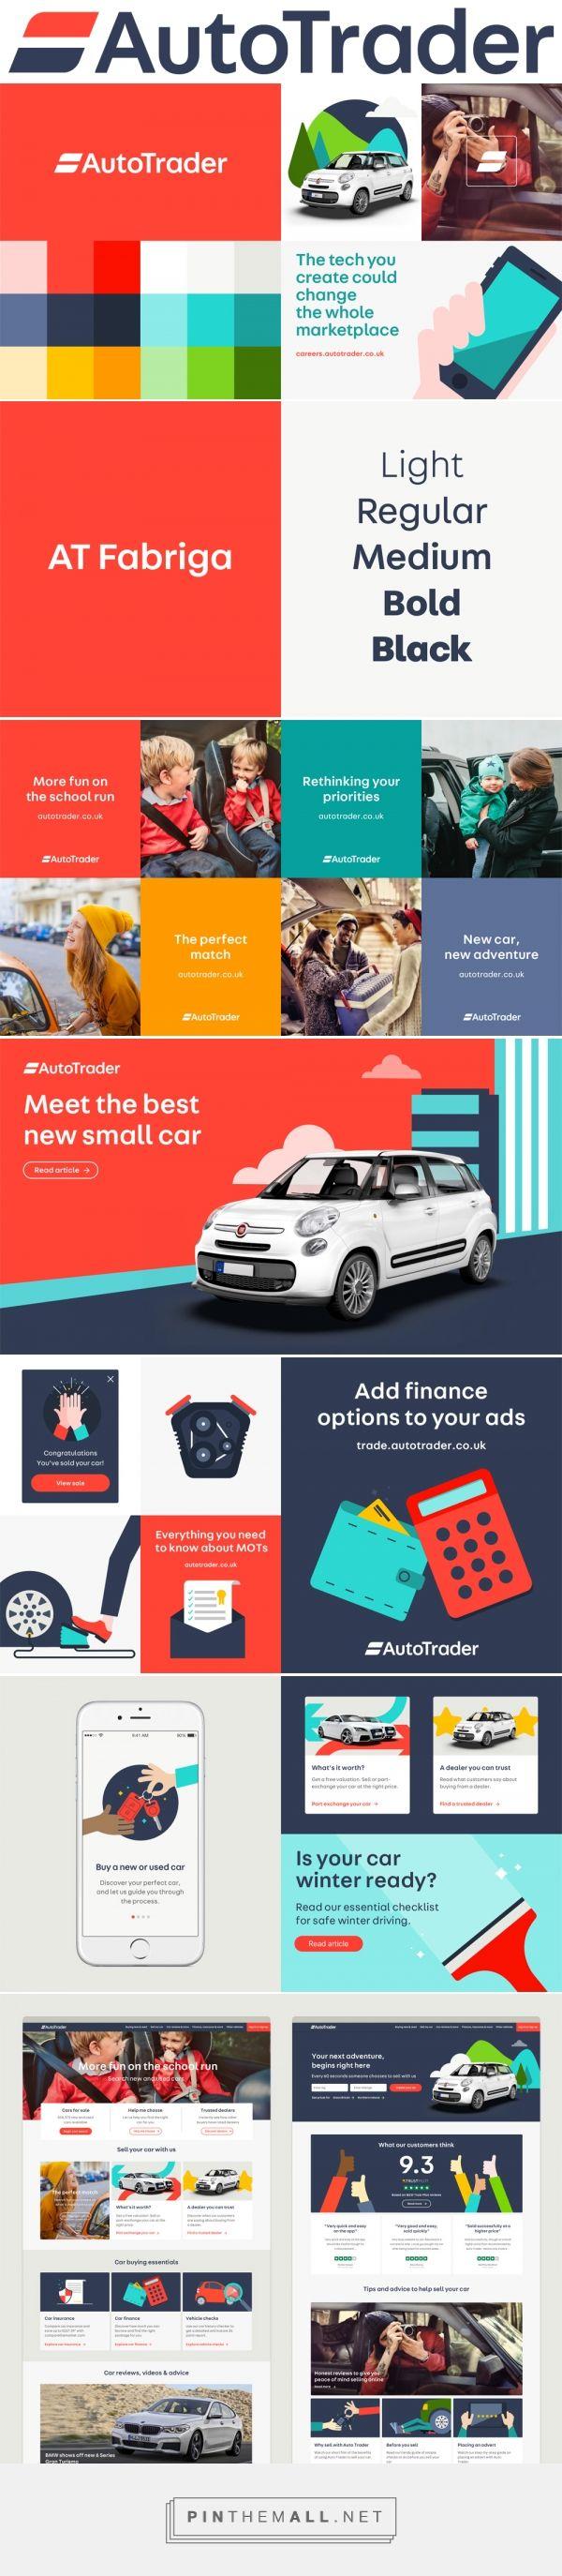 333 best BRAND | Identity images on Pinterest | Corporate identity ...